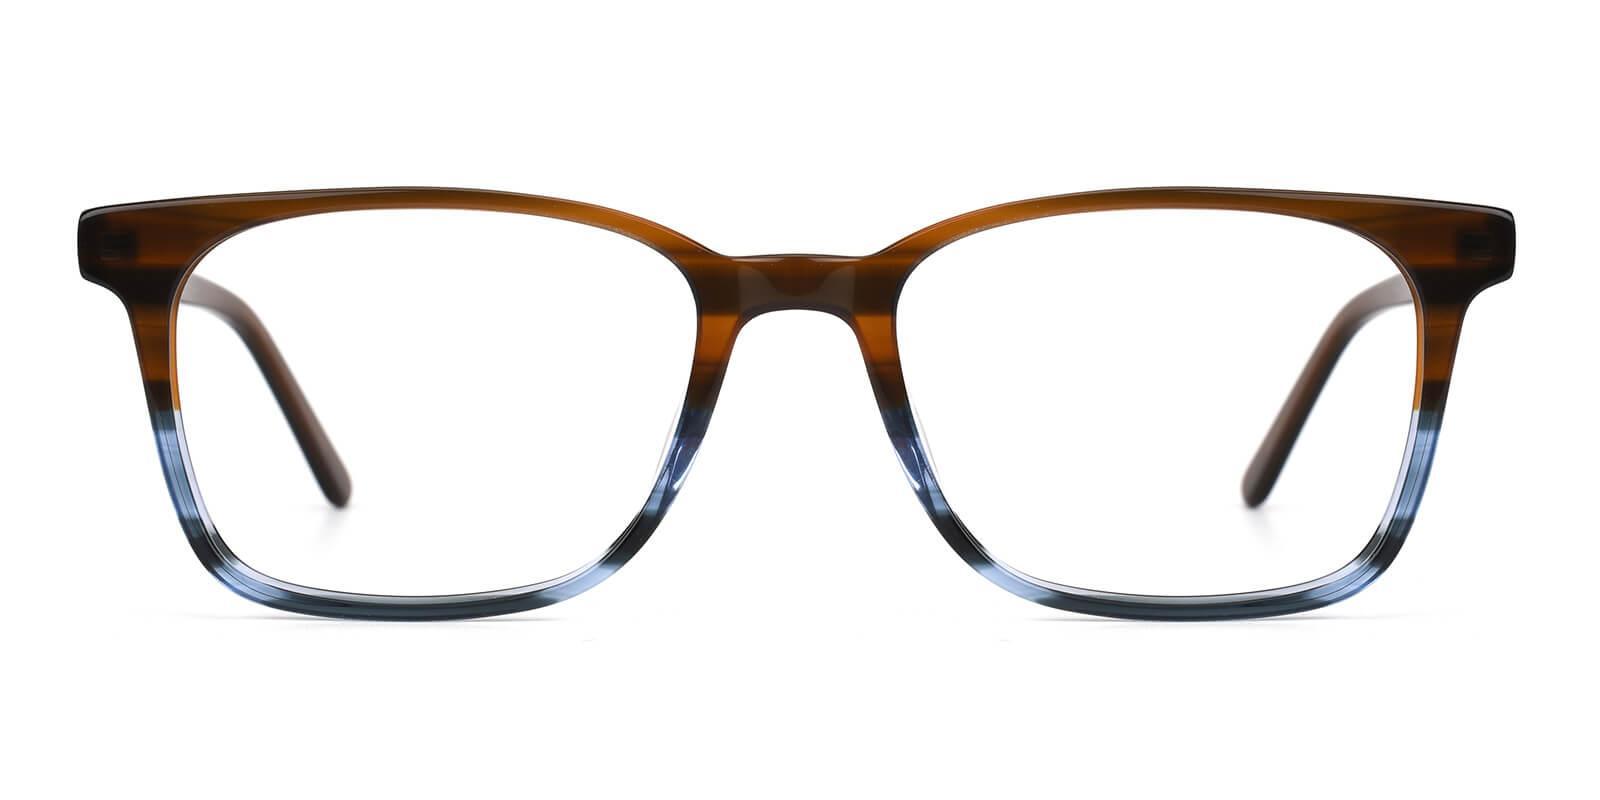 Kattan-Brown-Square-Acetate-Eyeglasses-additional2